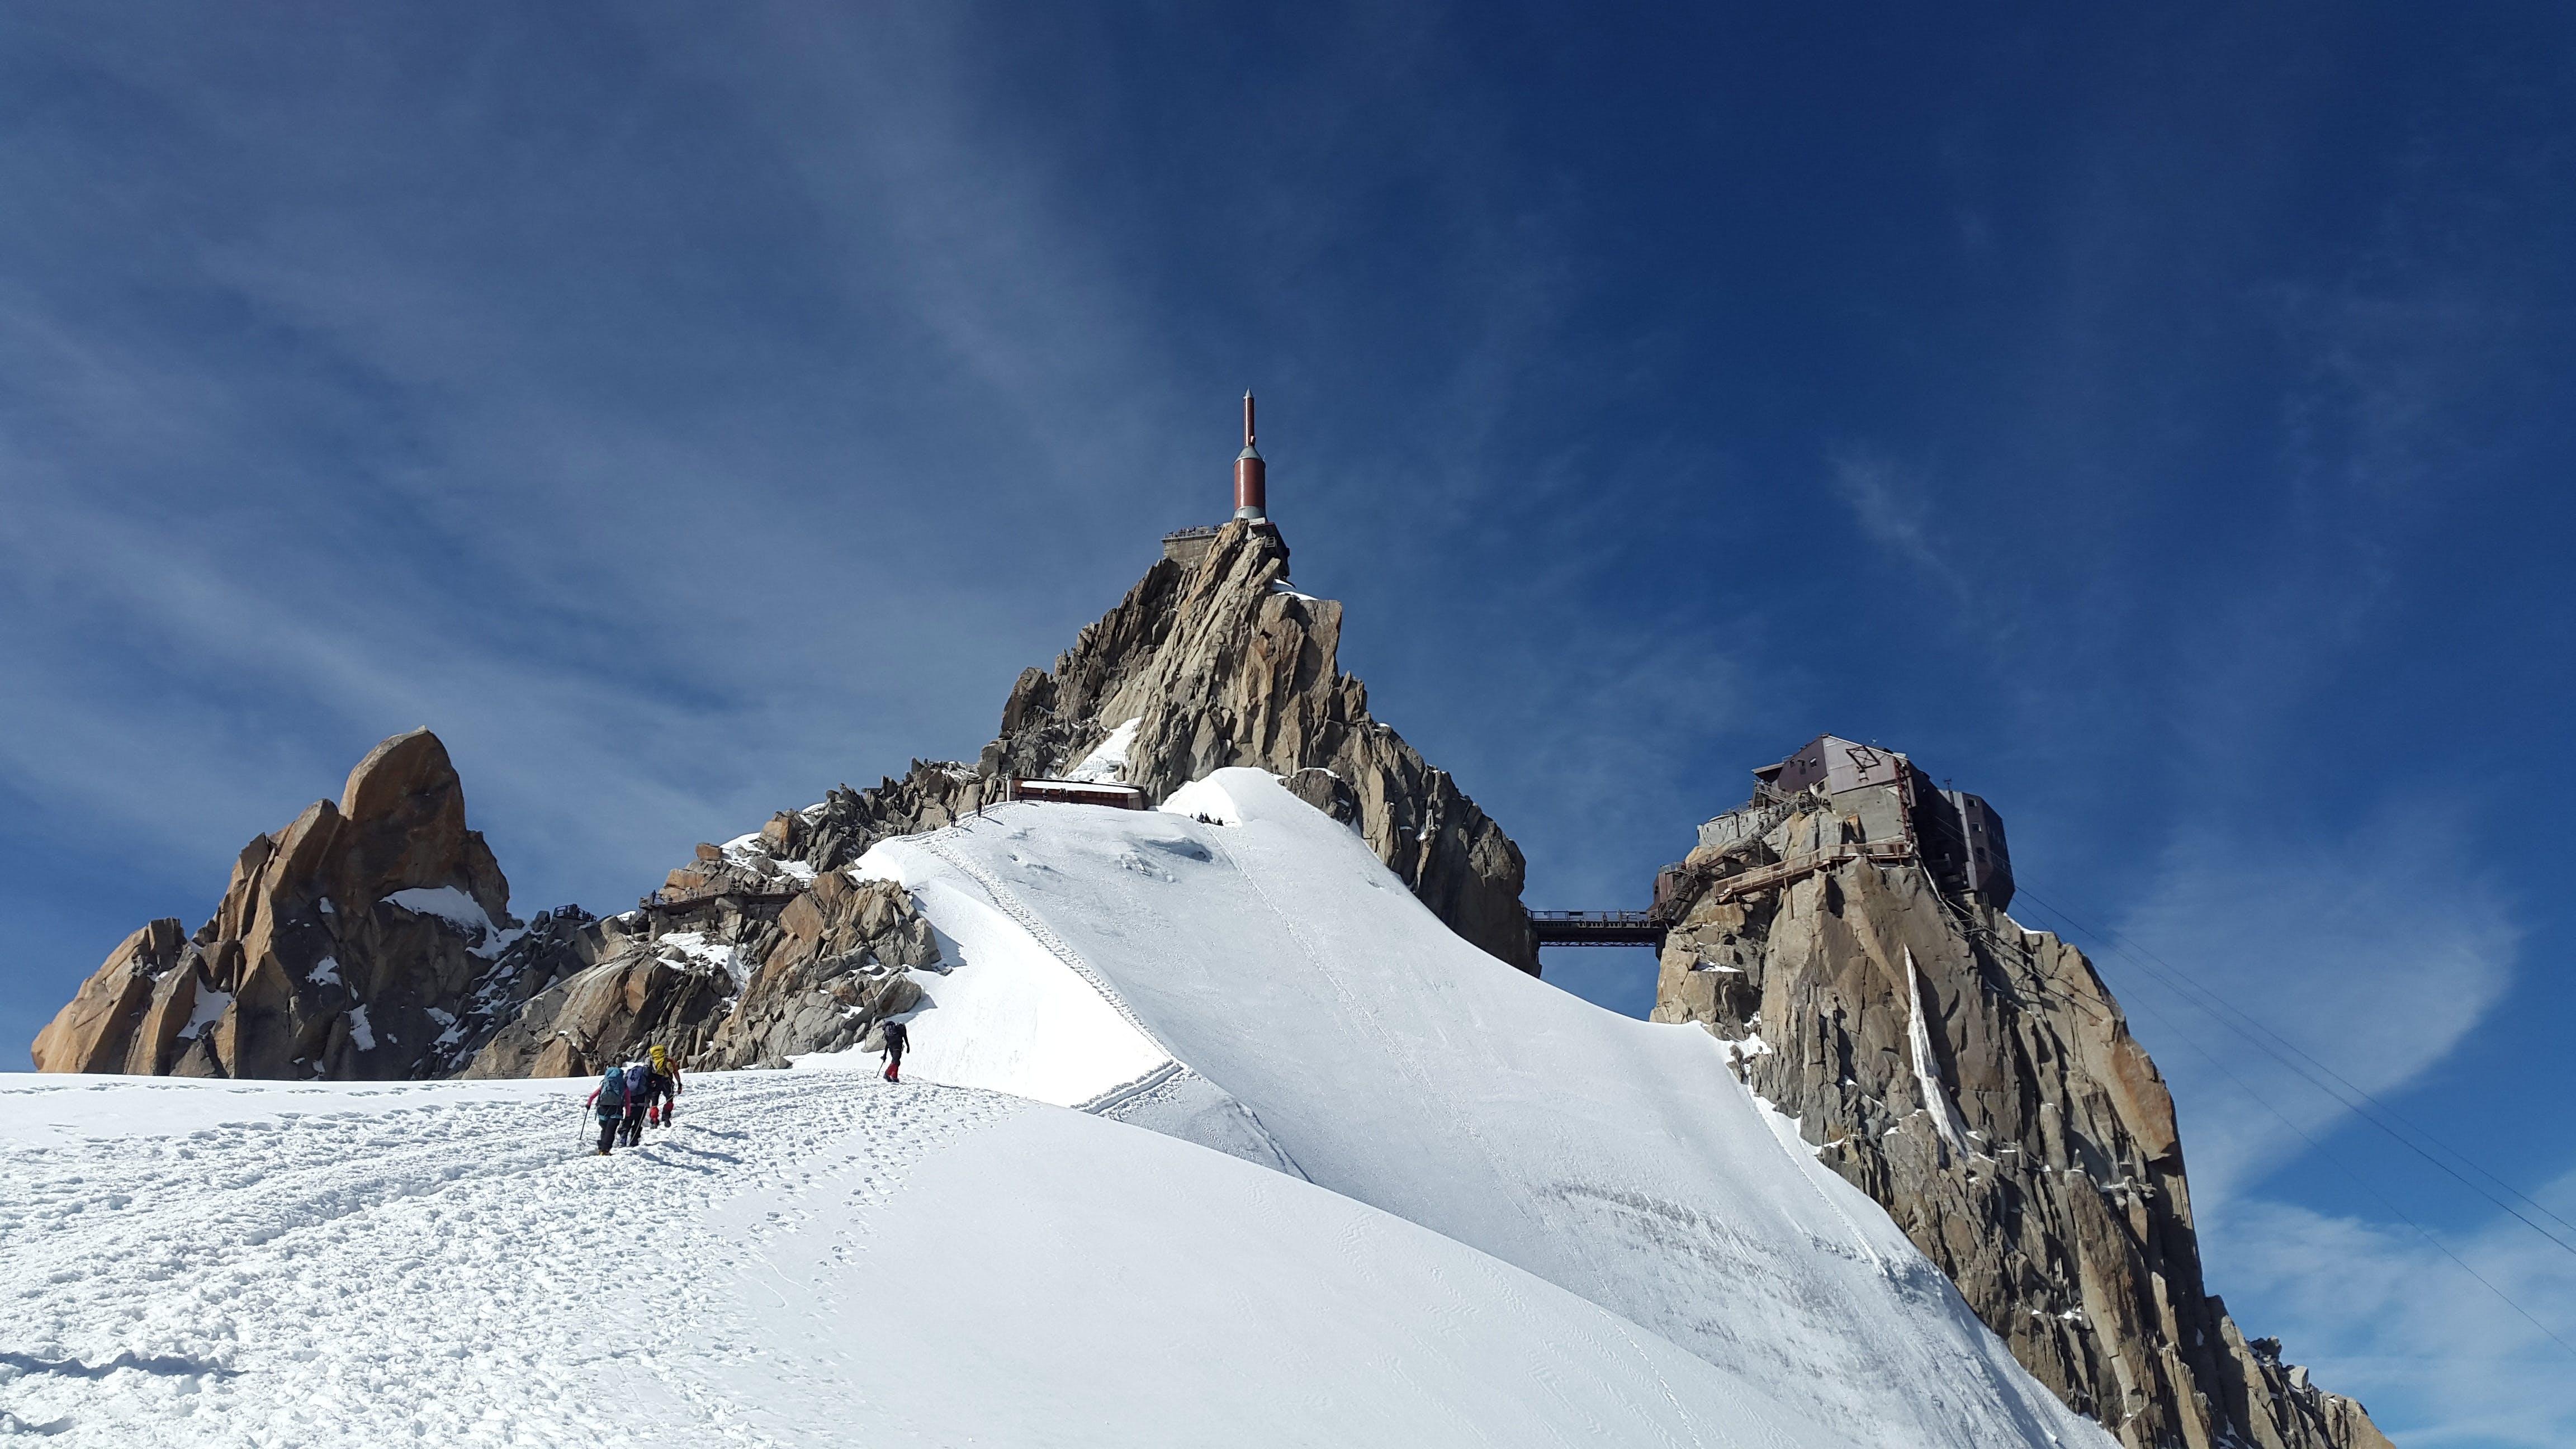 Fotos de stock gratuitas de alpinista, ascender, aventura, chamonix